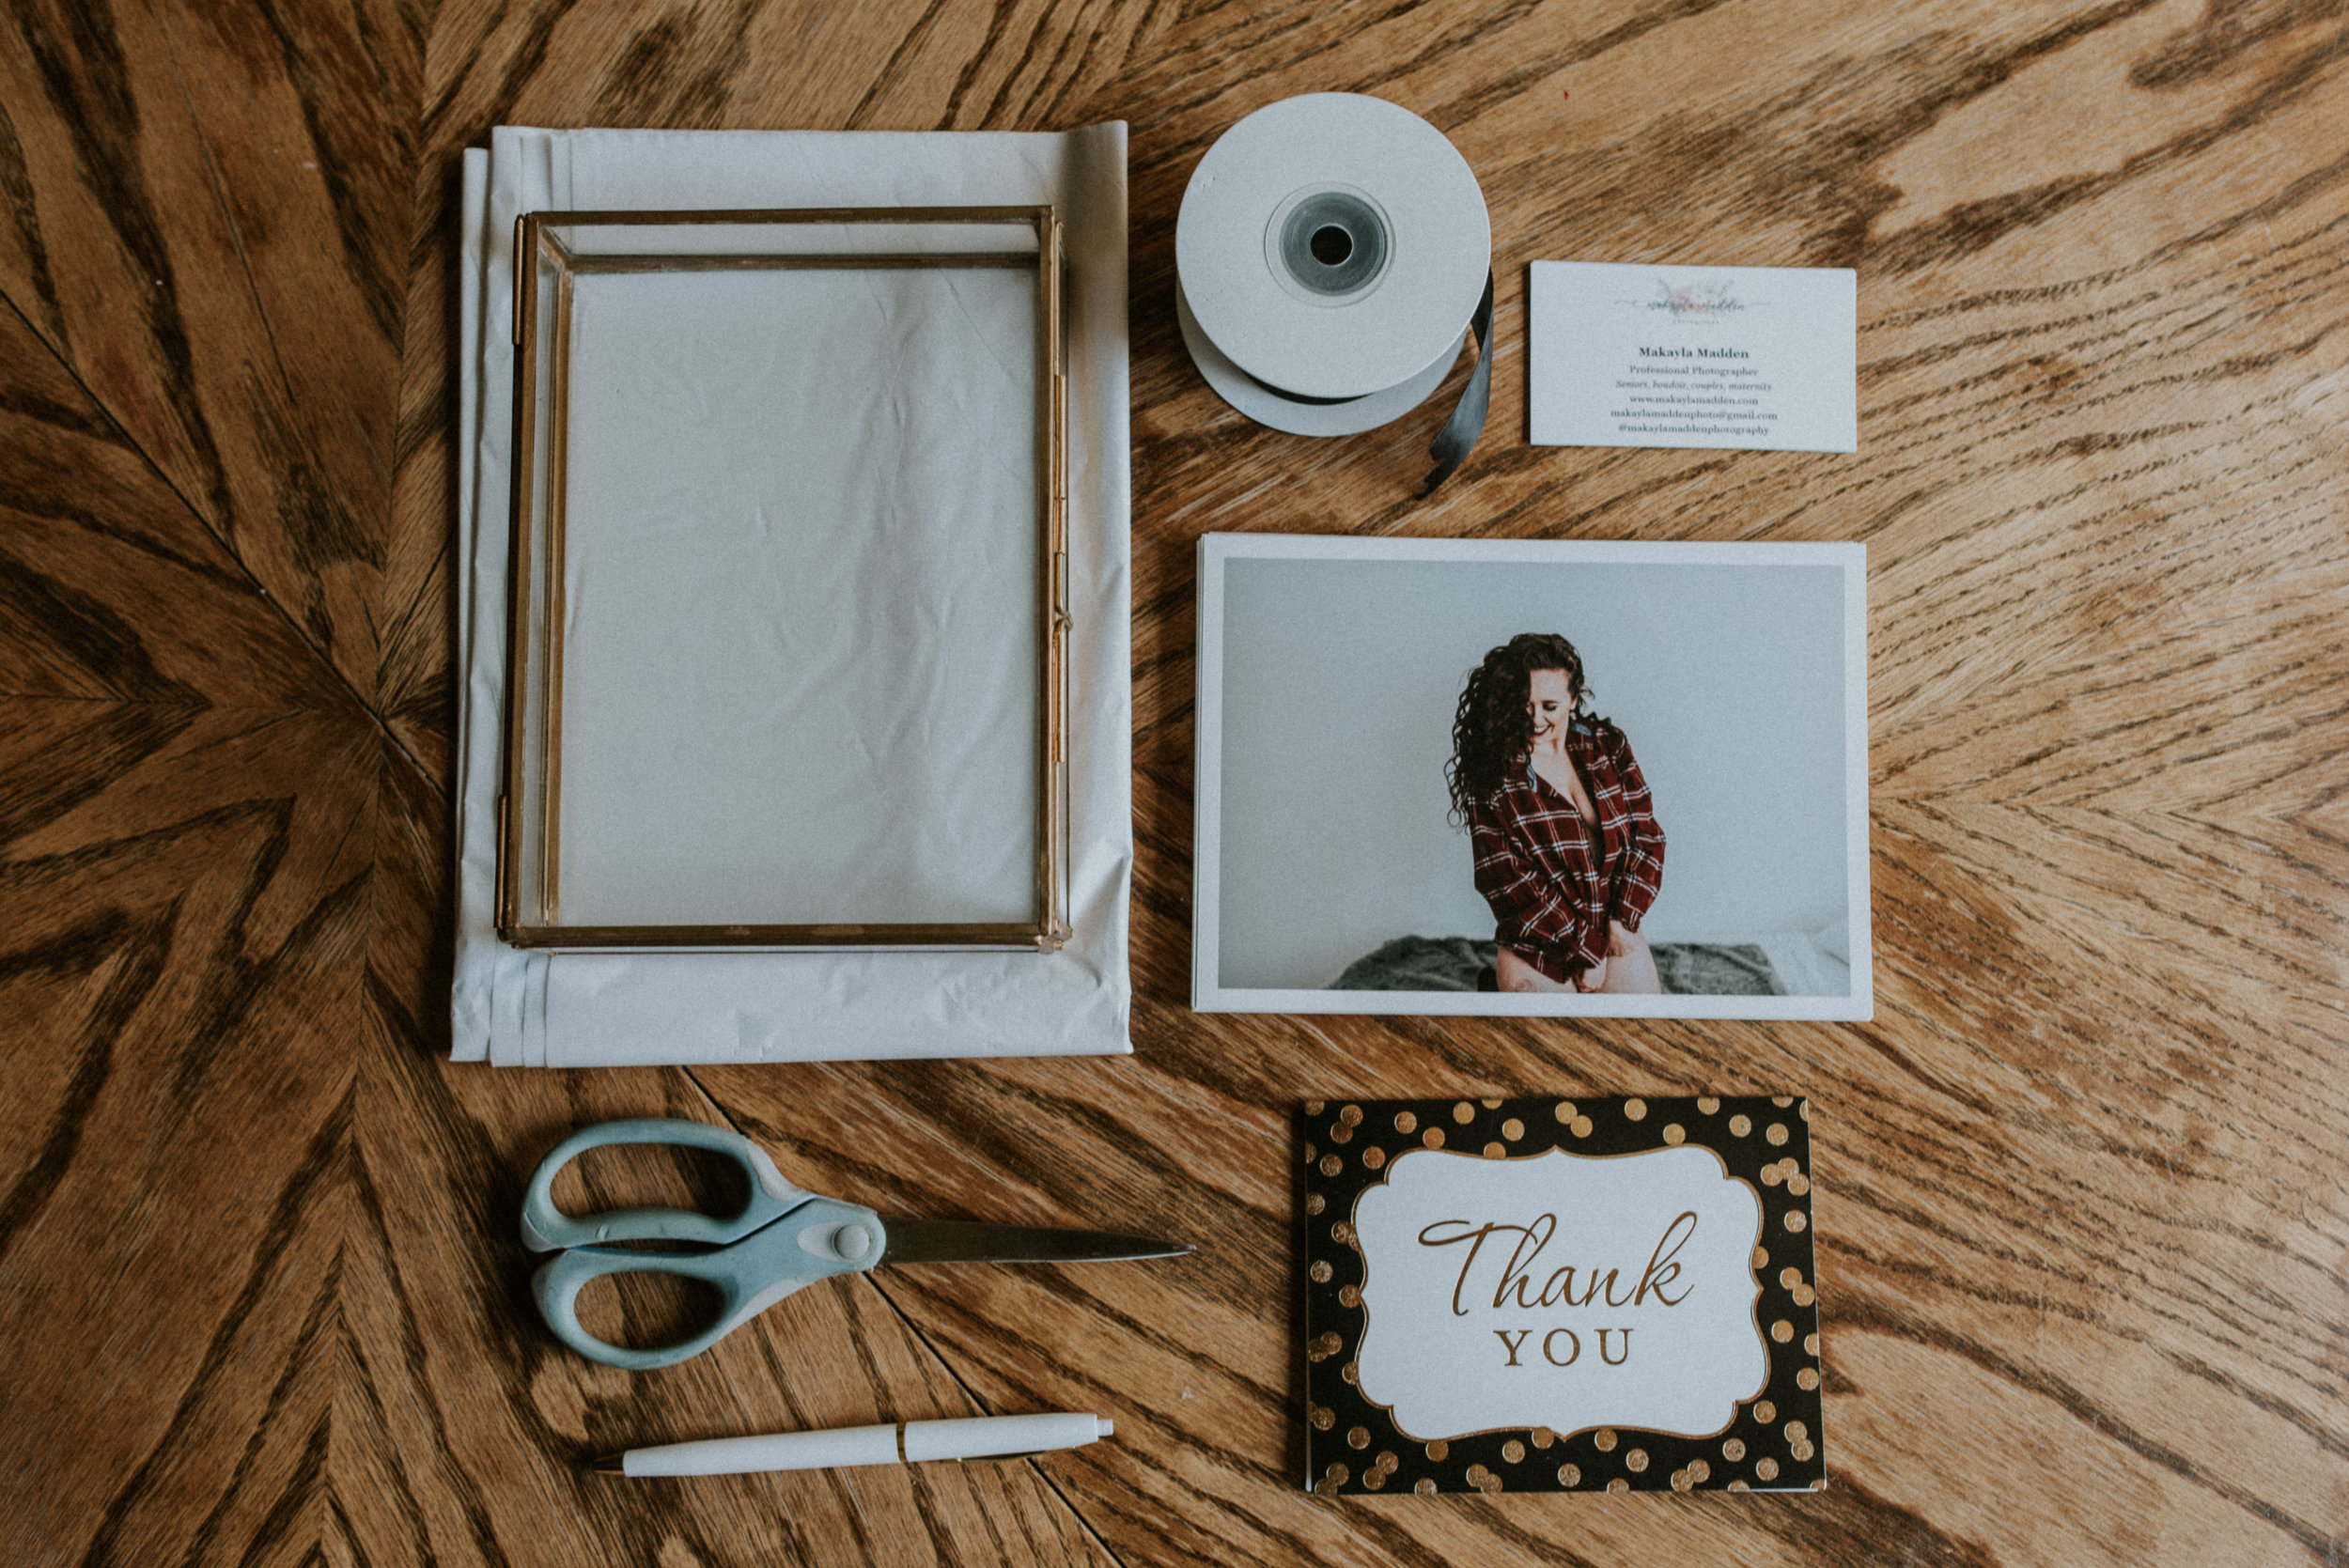 boise idaho boudoir photographer branding marketing glass folio picture box products